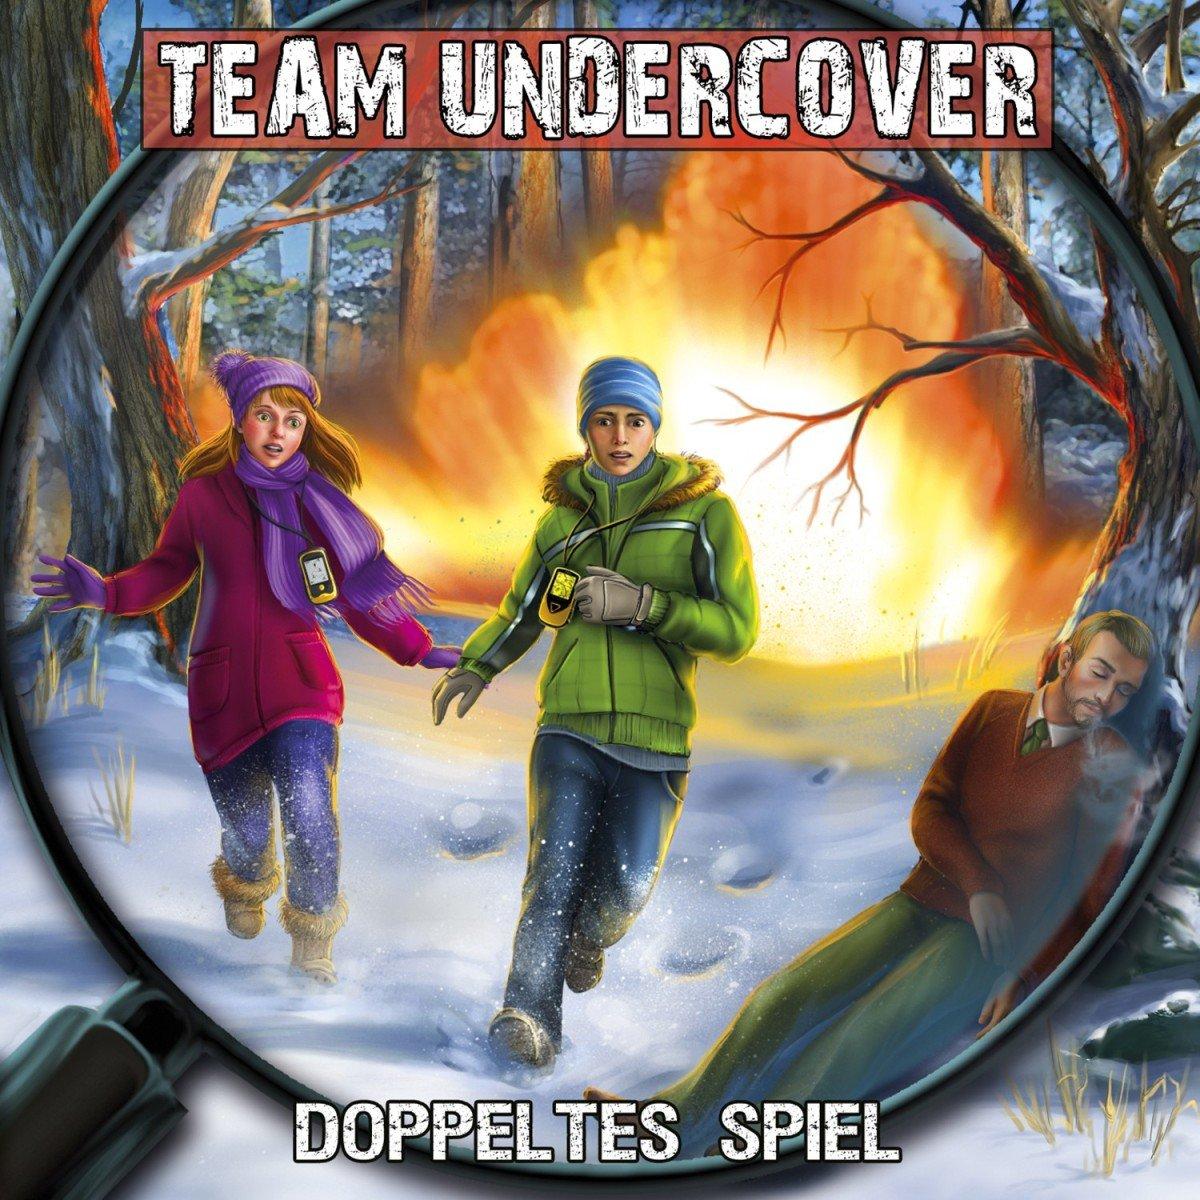 Team Undercover (7) Doppeltes Spiel (Contendo Media)